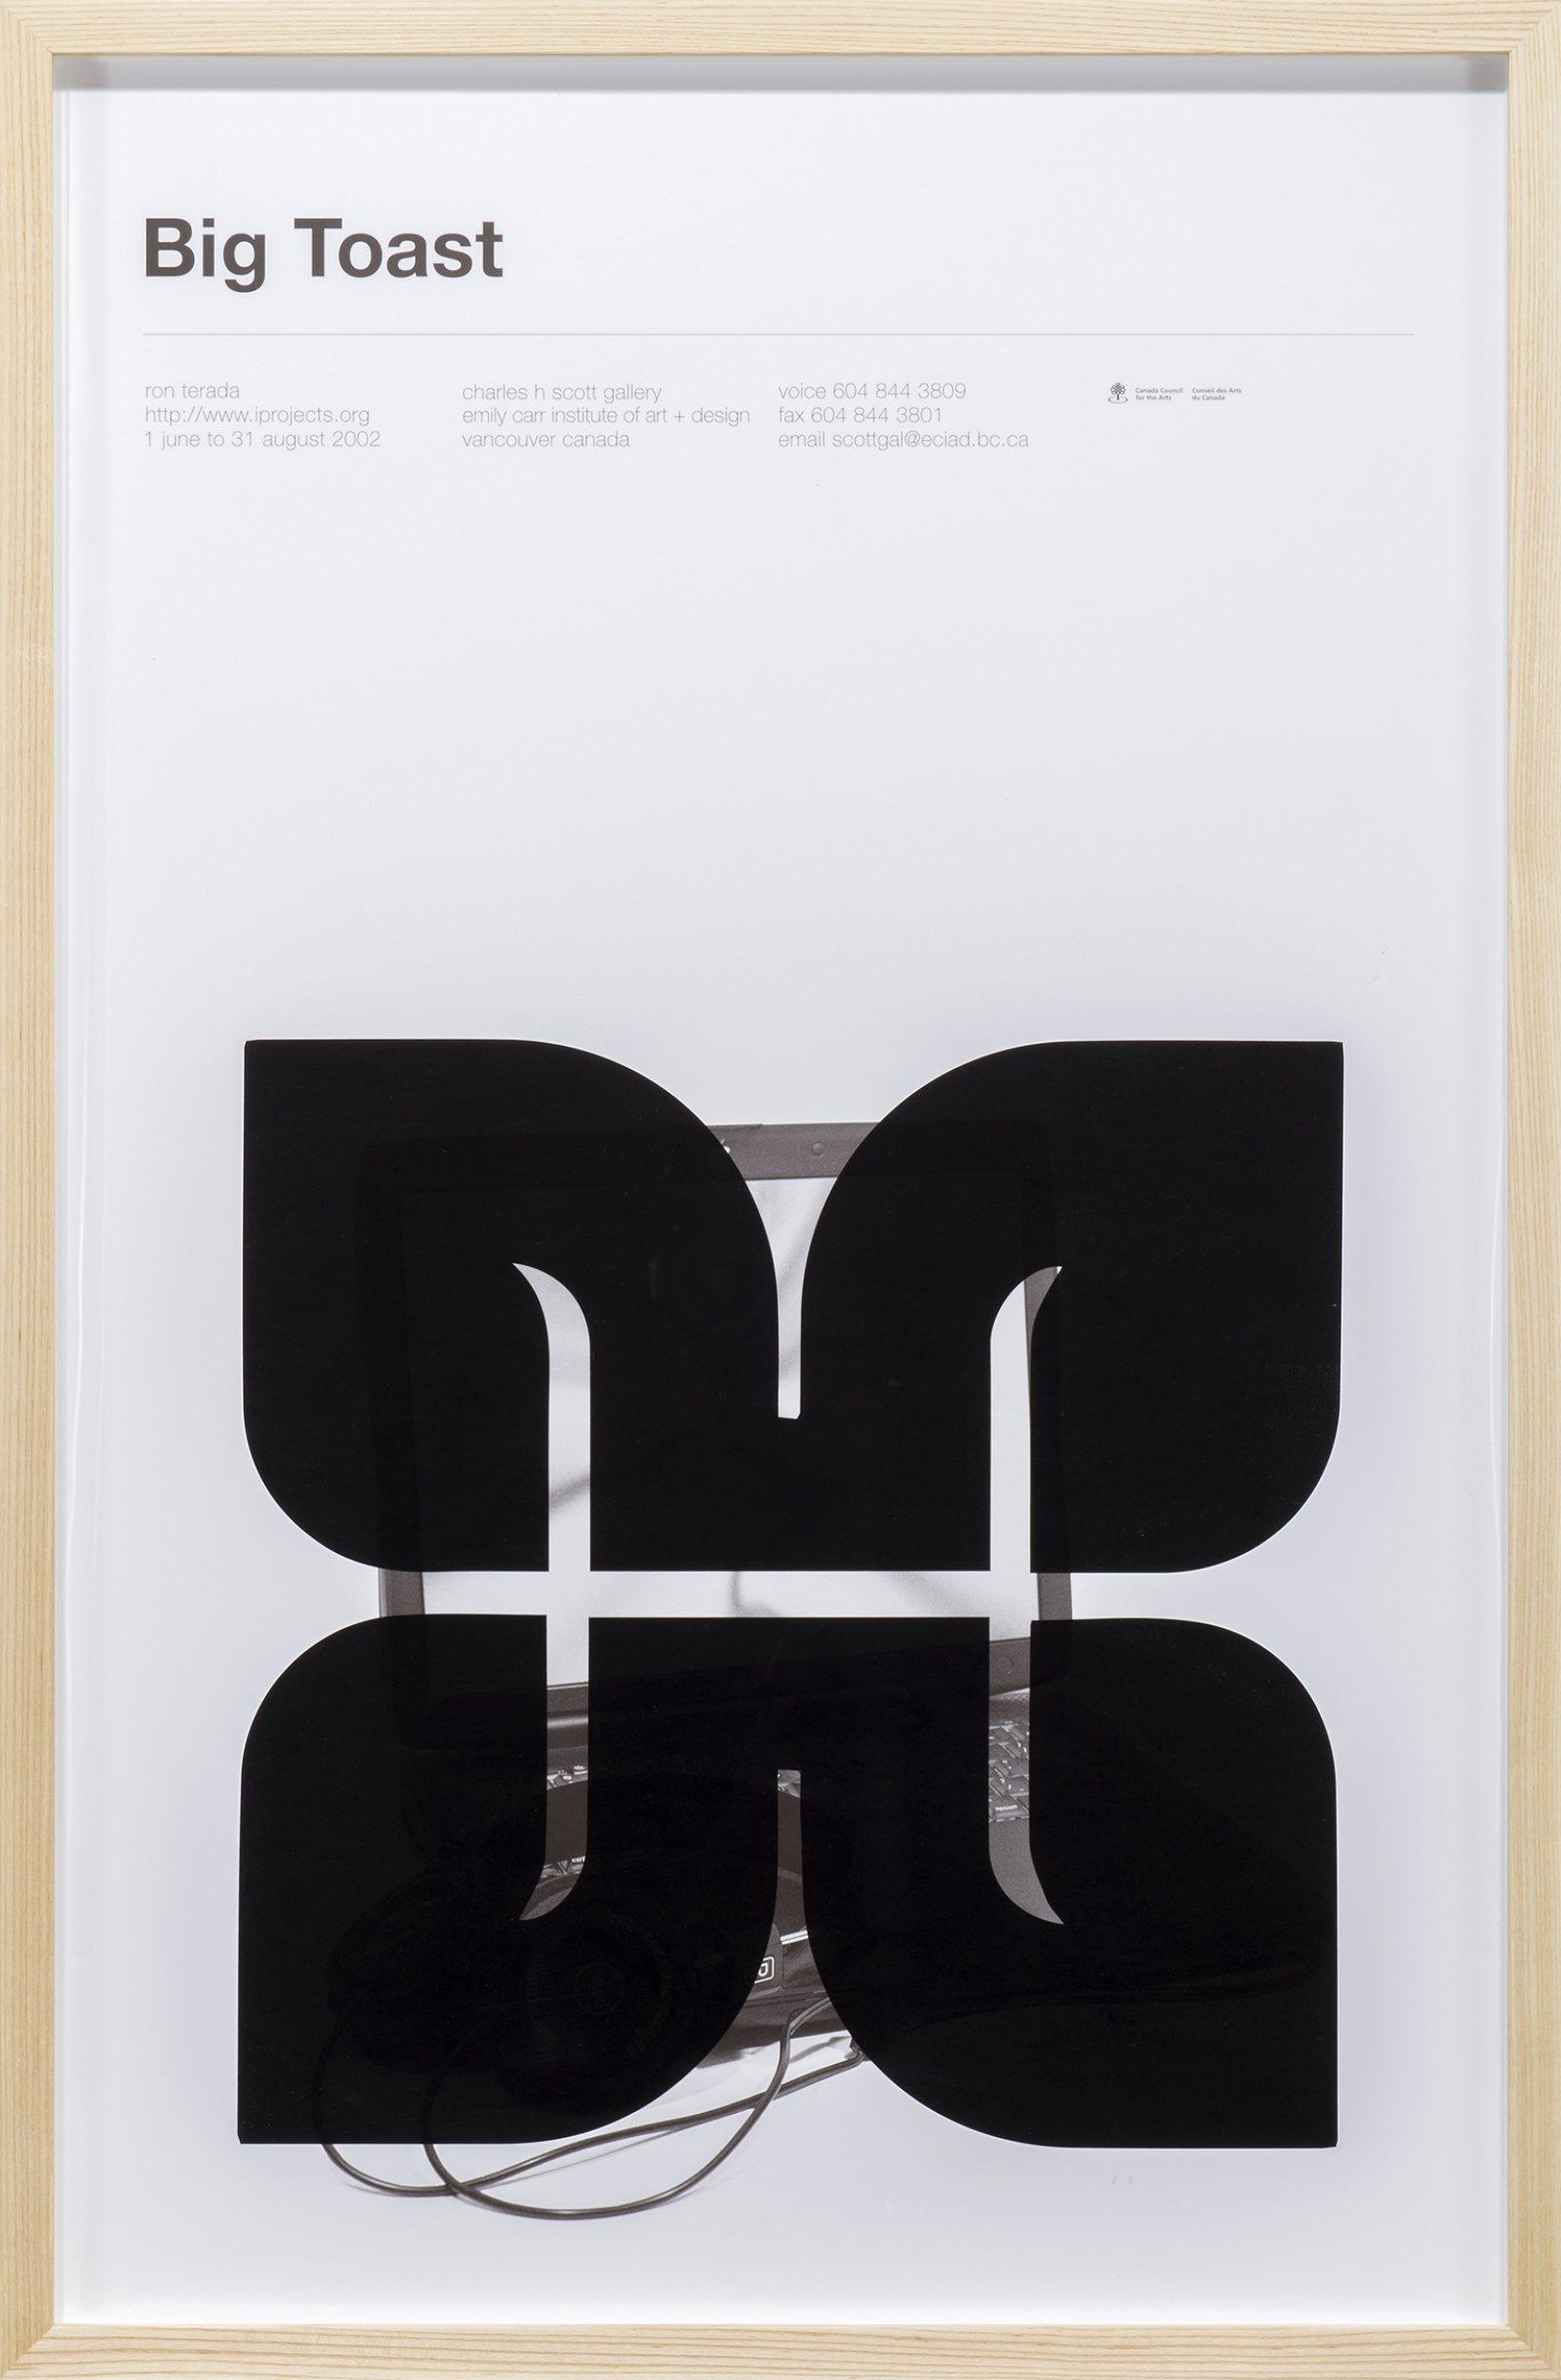 Ron Terada, Big Toast Logo #18, 2016, inkjet print on offset printed poster, 34 x 22 in. (86 x 56 cm) by Ron Terada